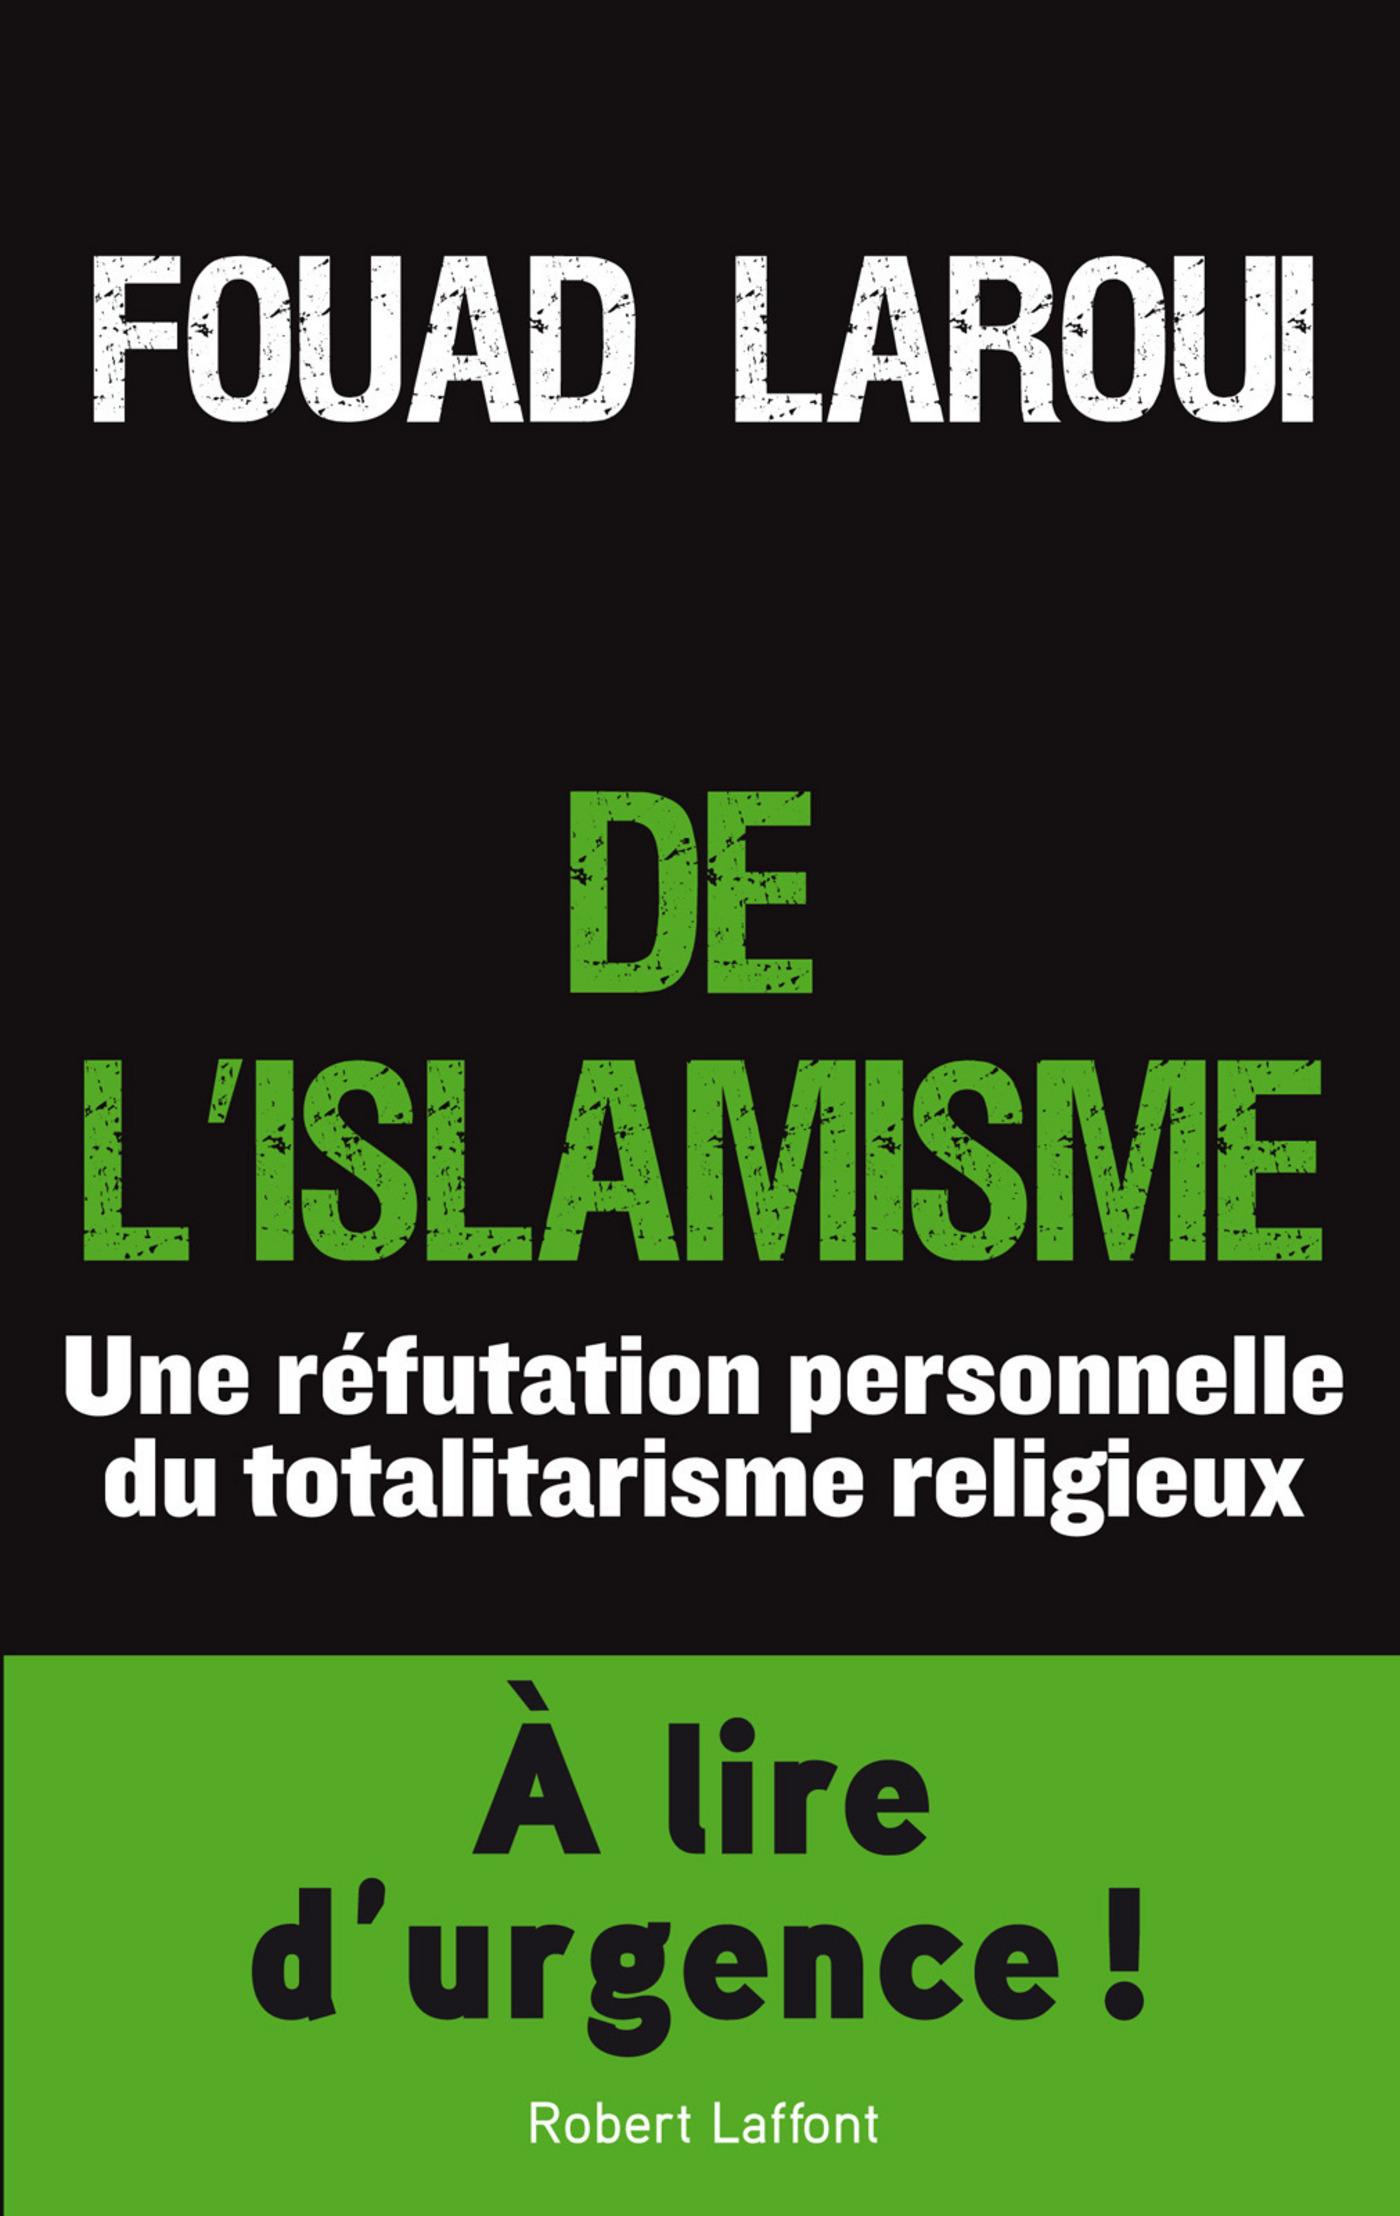 De l'islamisme   LAROUI, Fouad